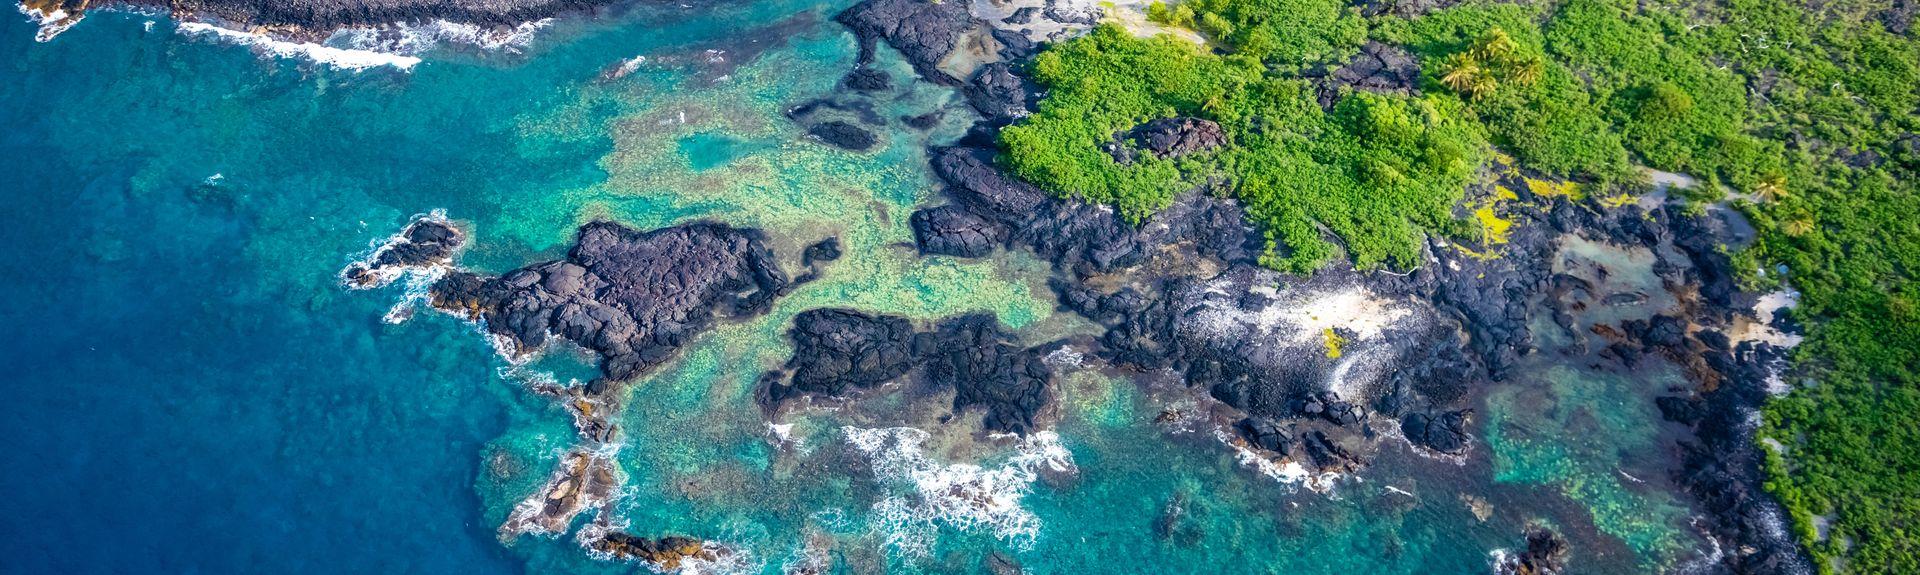 Keauhou, Kailua-Kona, Hawaii, United States of America